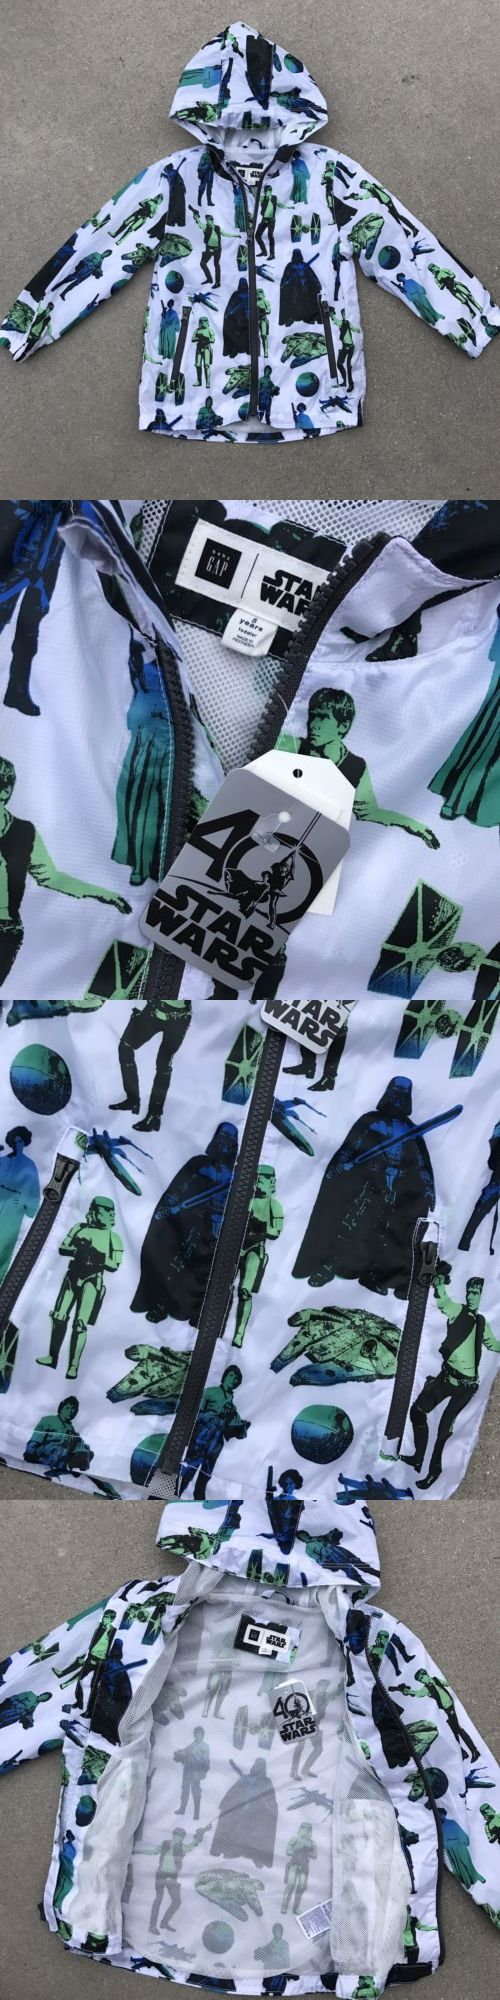 Outerwear 147324 Nwt Baby Gap Star Wars Graphic